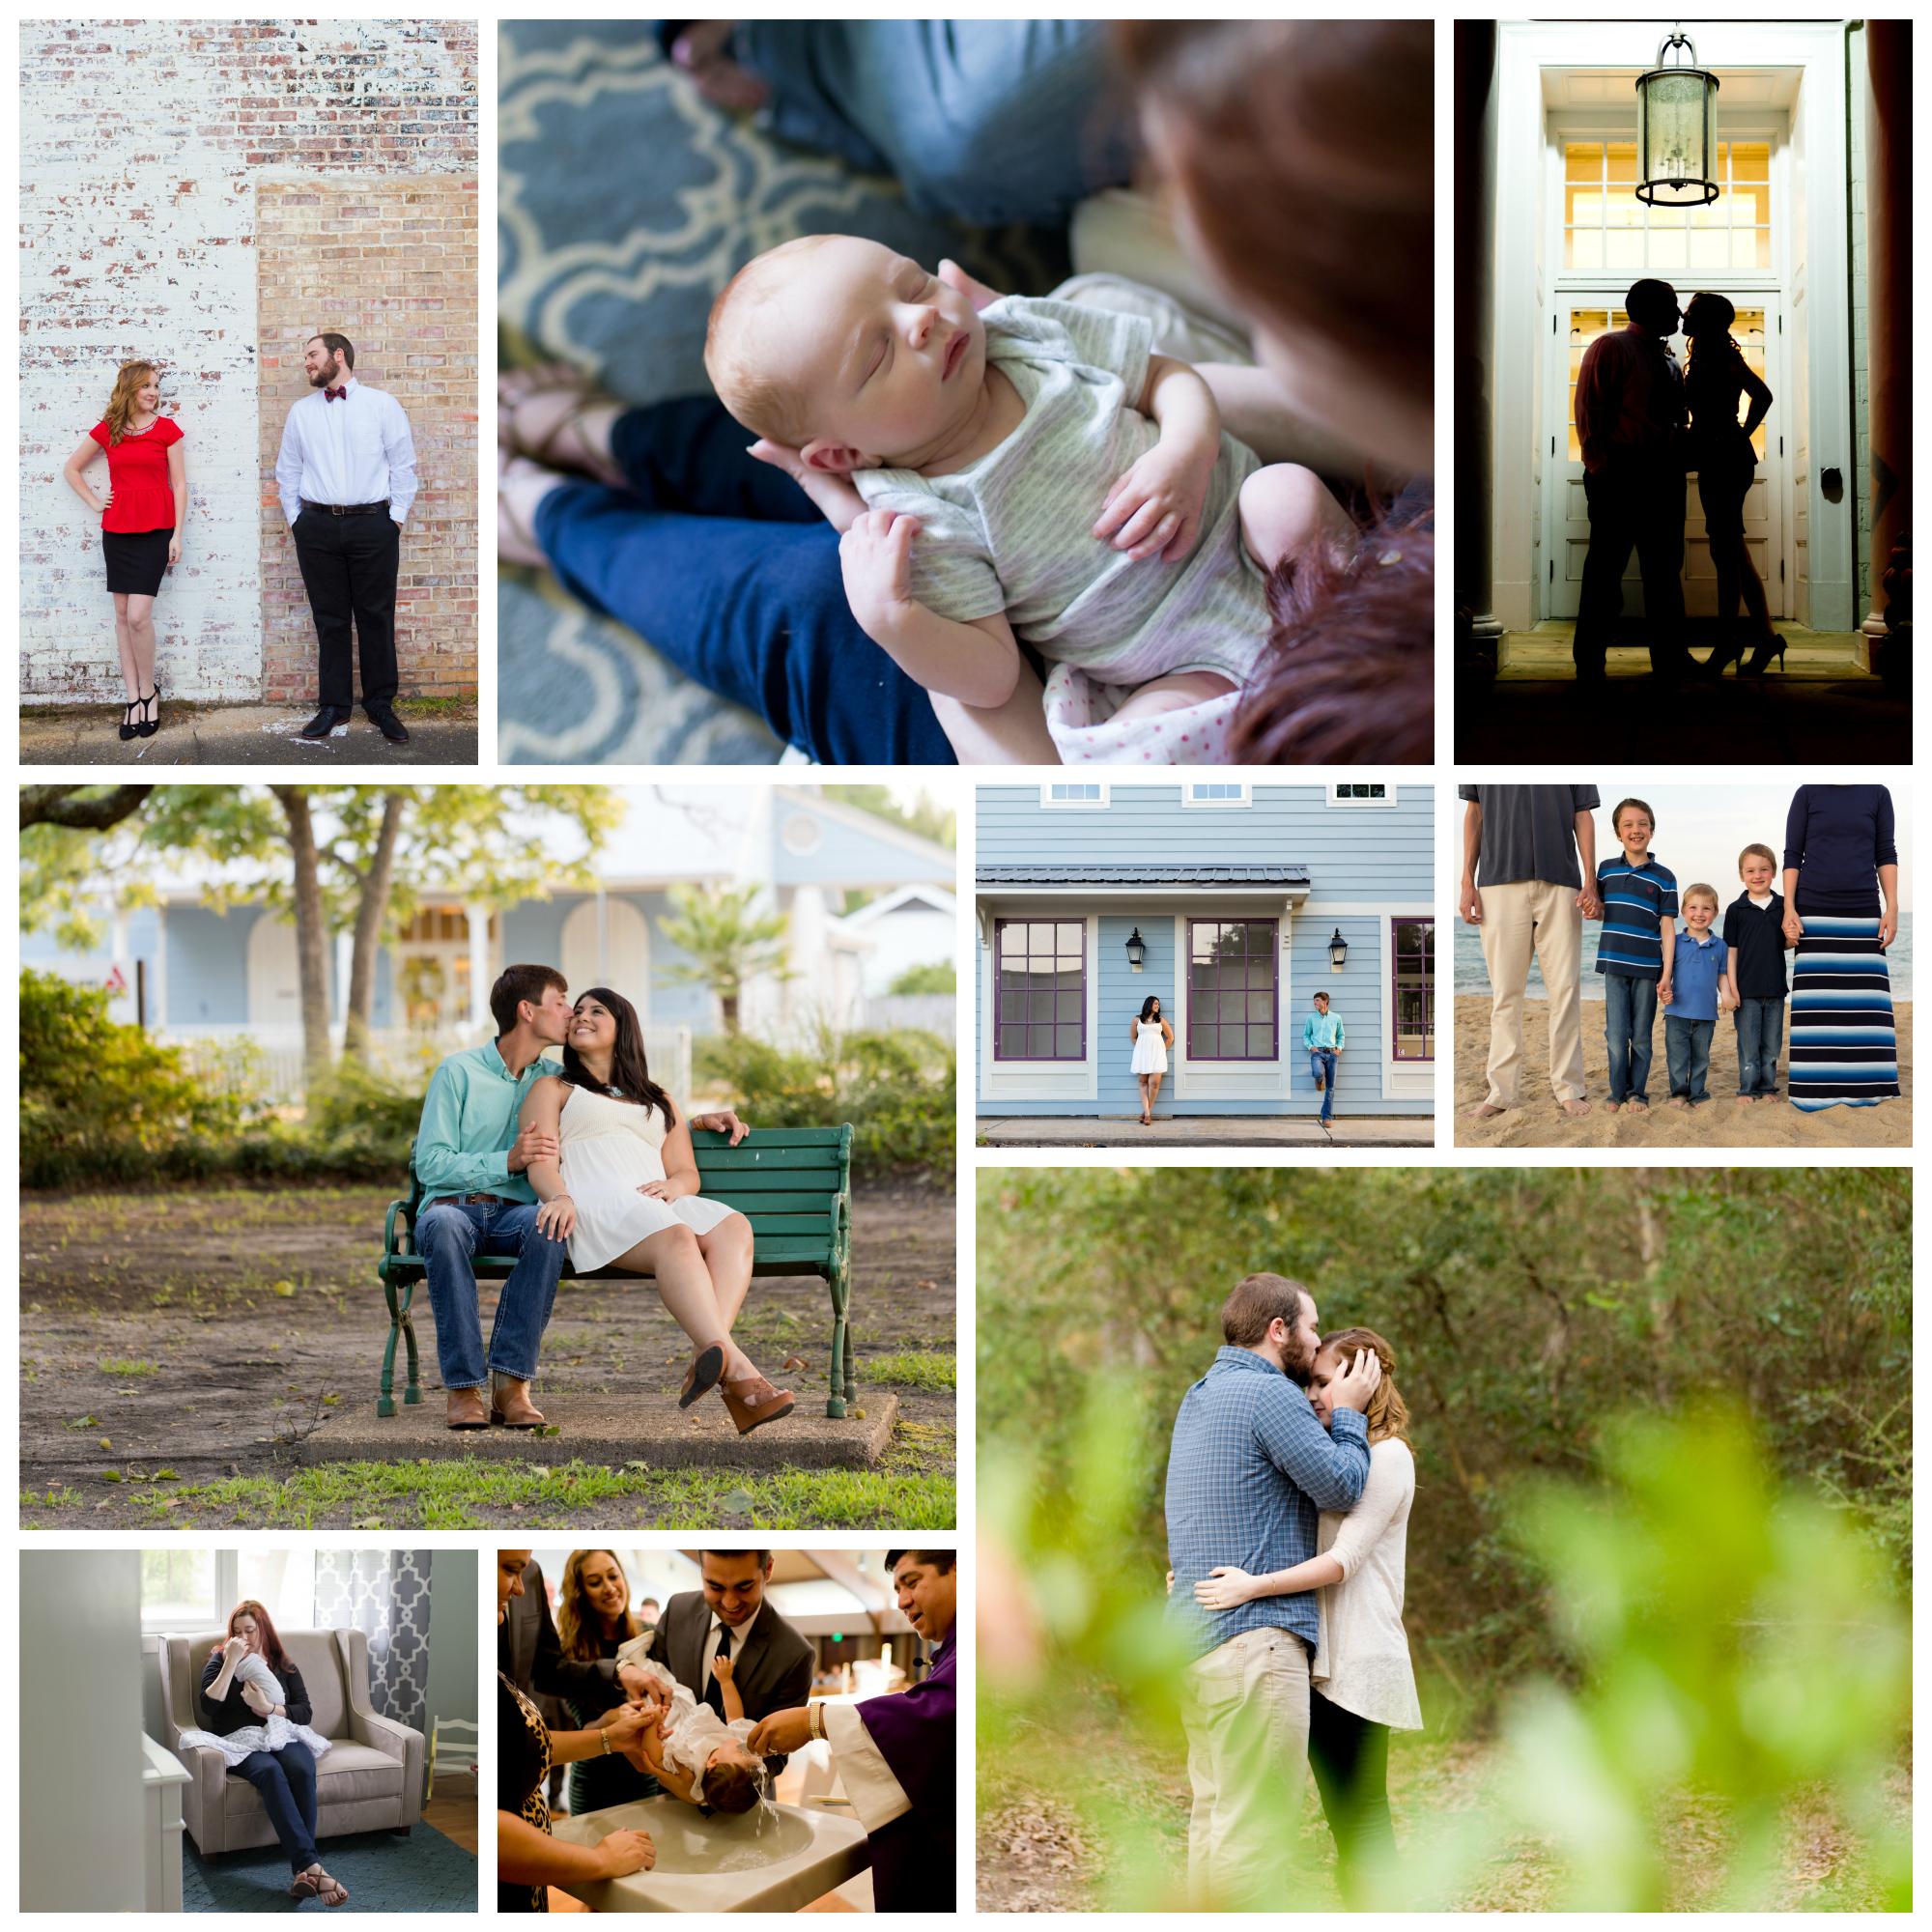 Uninvented Colors Photography 2015 portrait sessions (engagement, newborn, family, baptism photos)